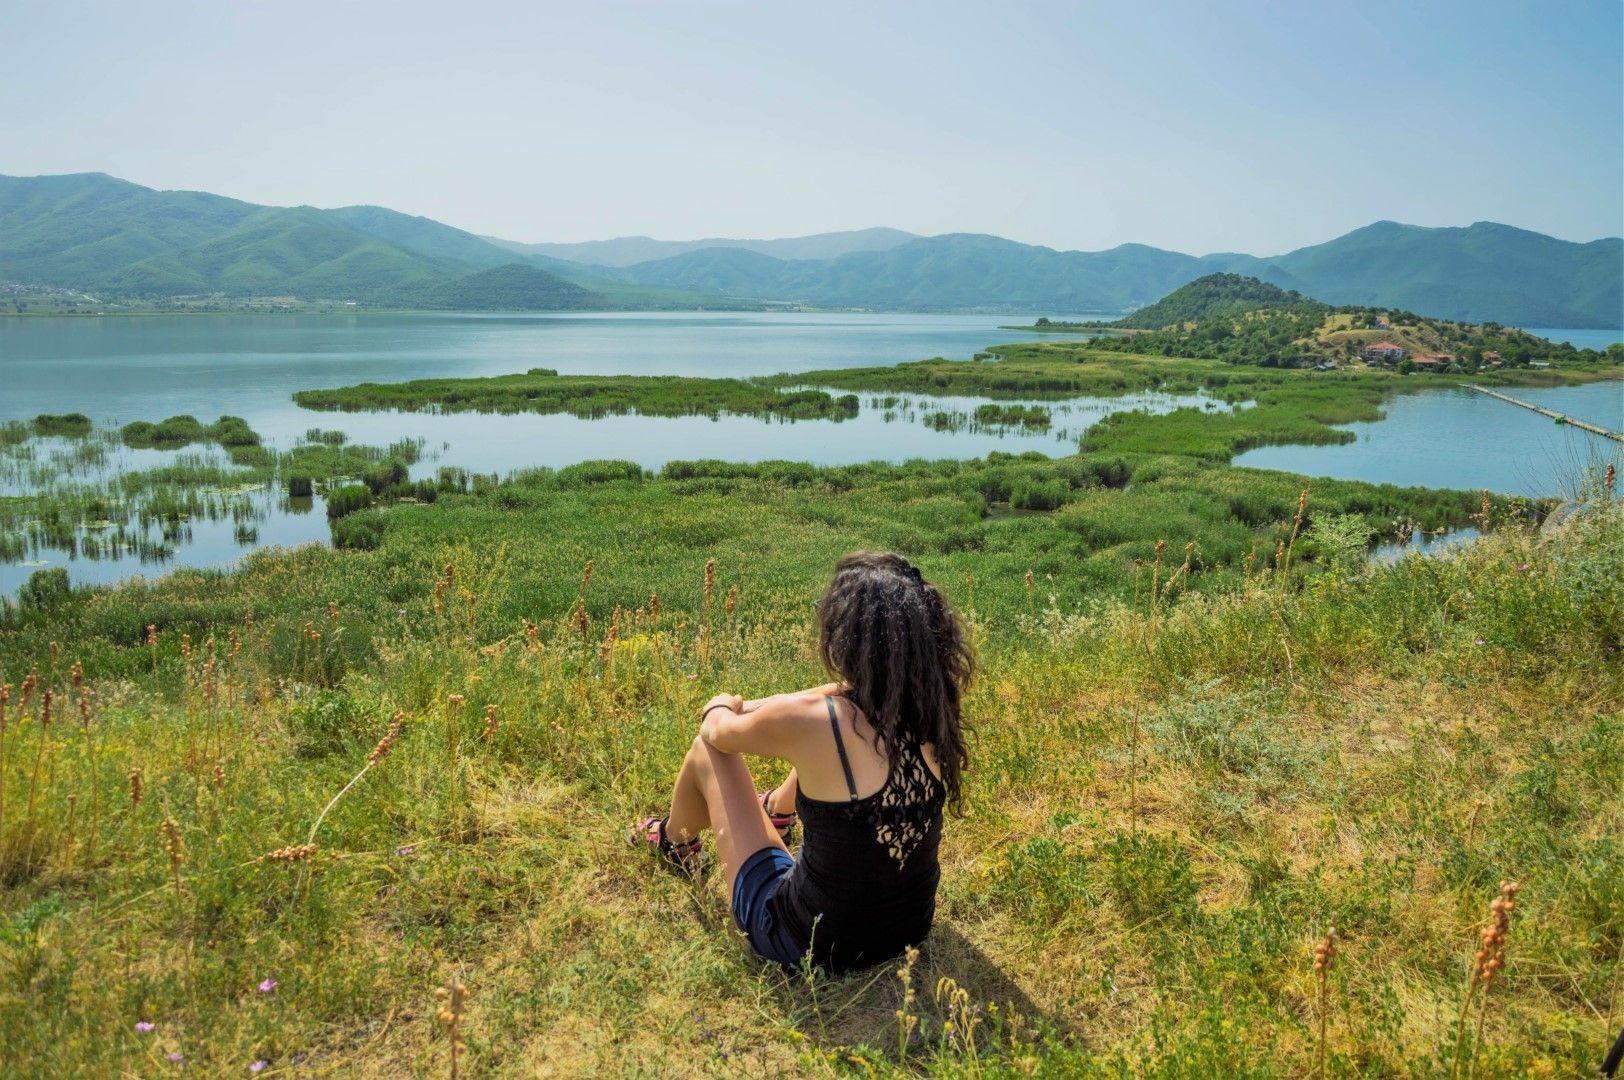 Поглед отвисоко към остров Свети Ахил и Преспанското езеро